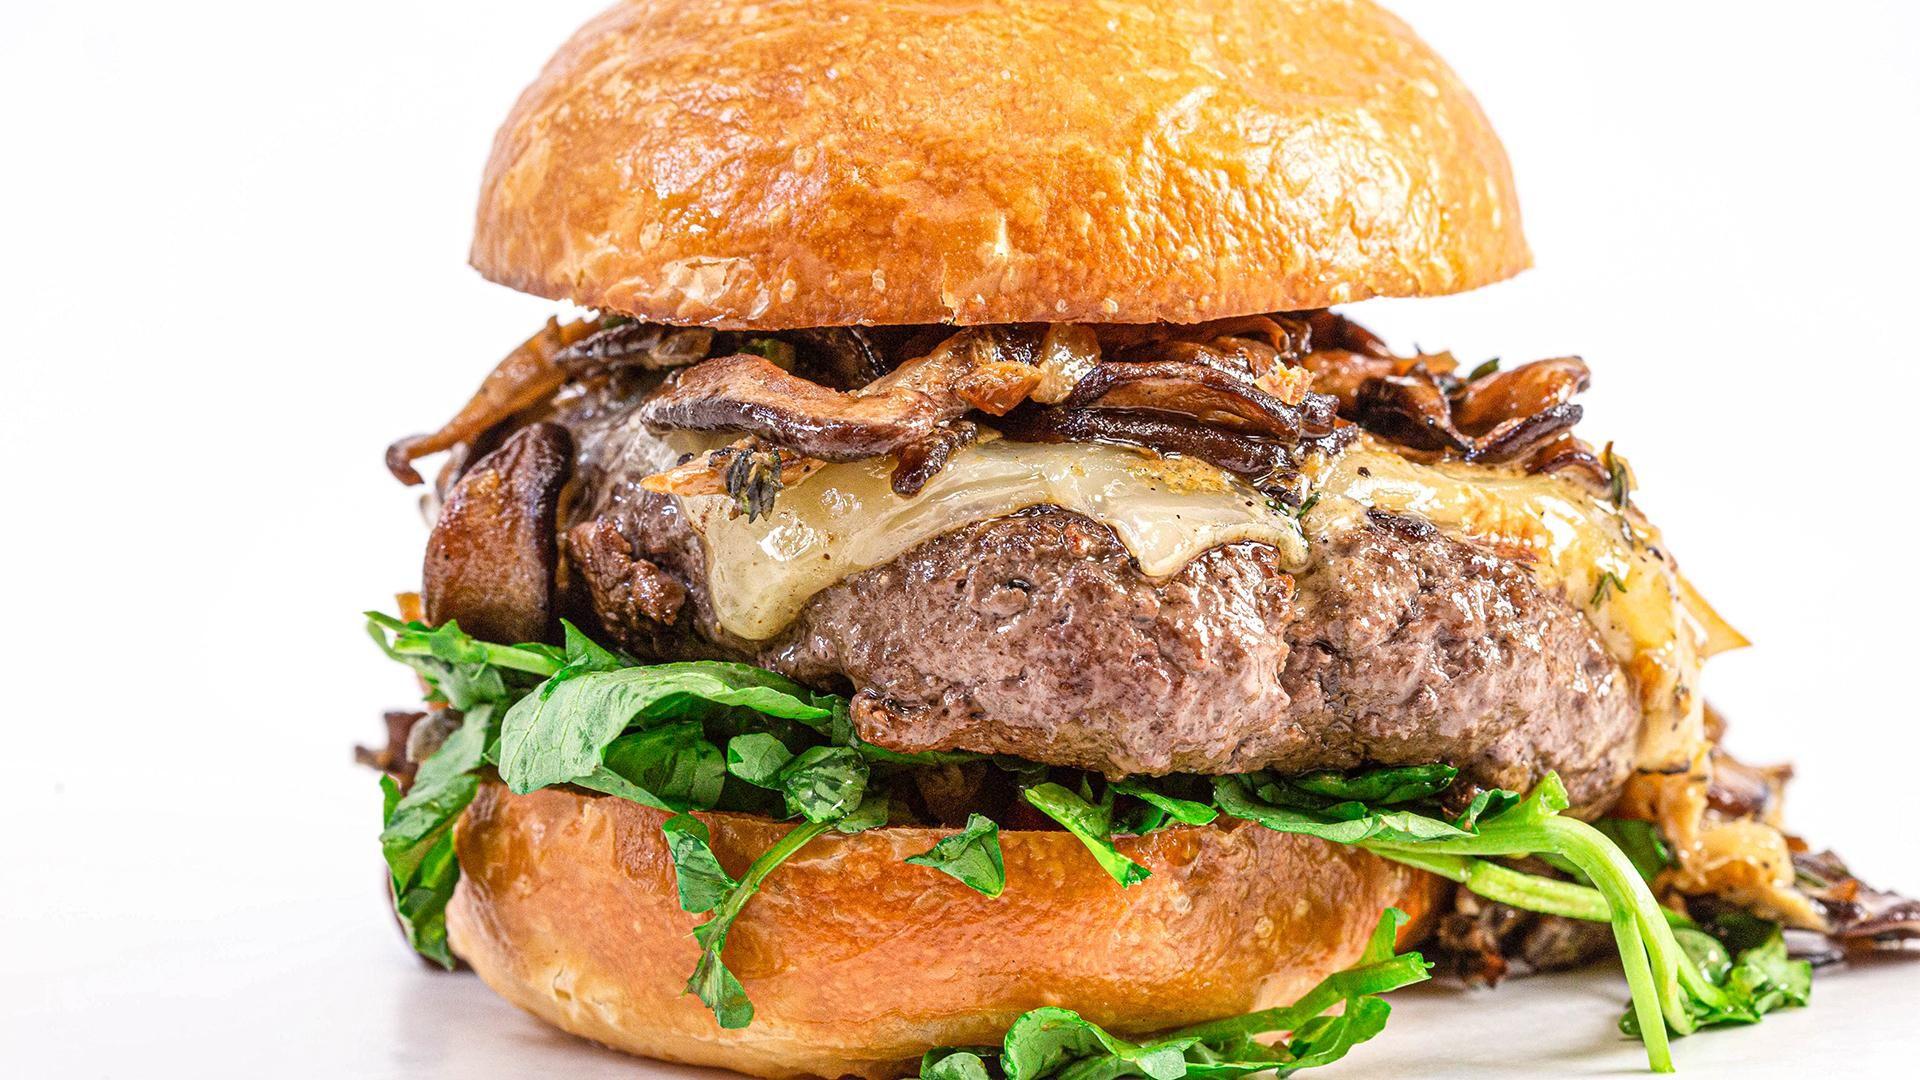 Rach S Ultimate Mushroom Swiss Burger On Brioche Recipe In 2020 Mushroom Swiss Burger Stuffed Mushrooms Burger